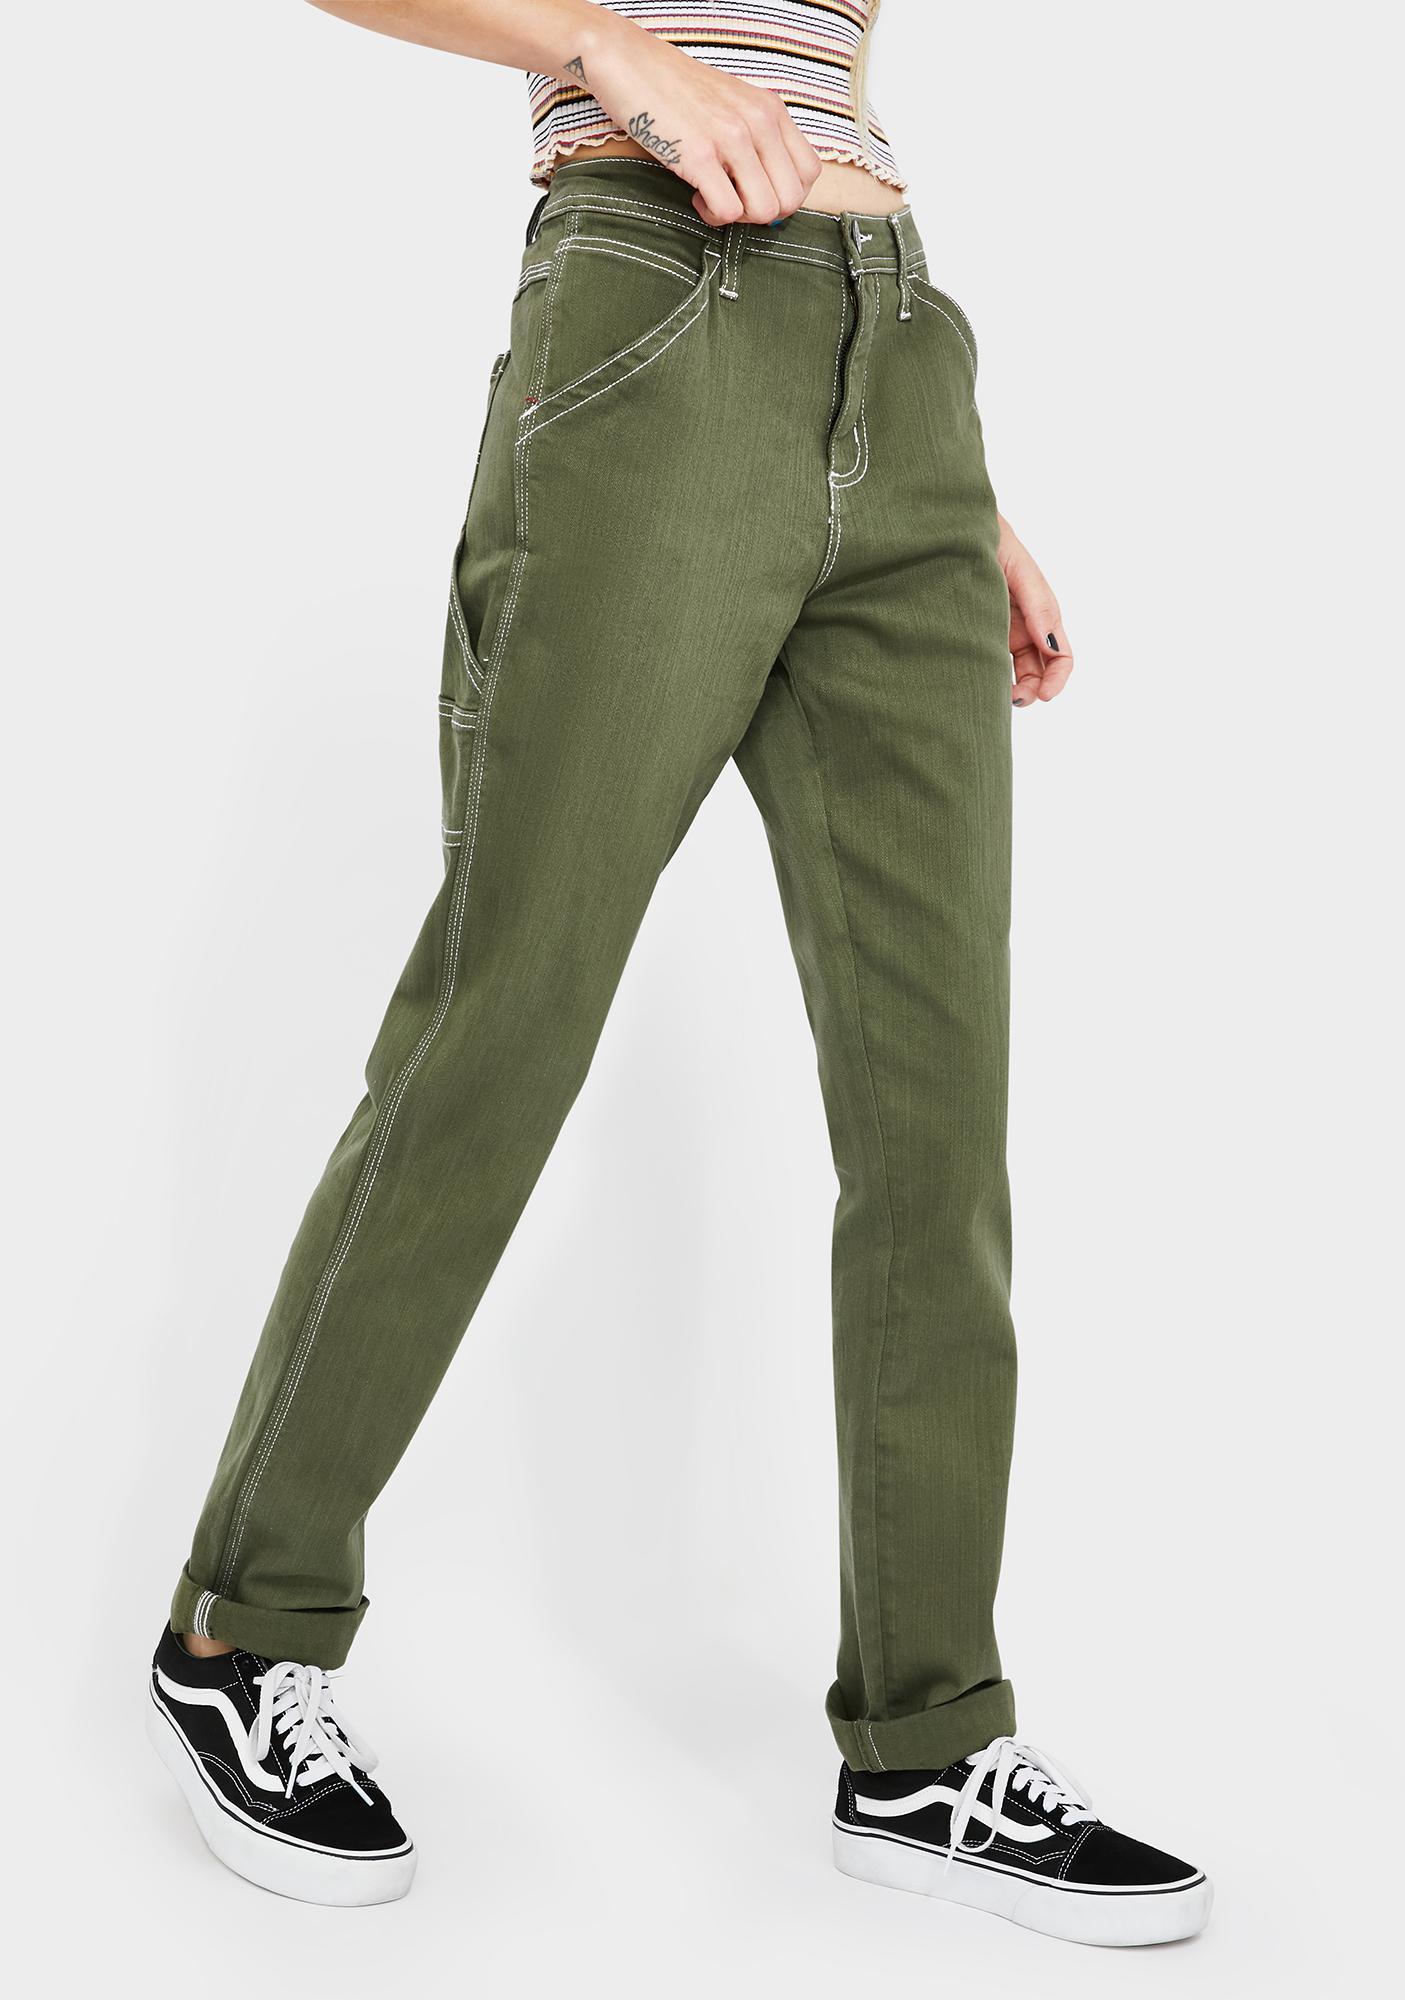 Dickies Girl Olive Slim Rolled Hem Carpenter Pants